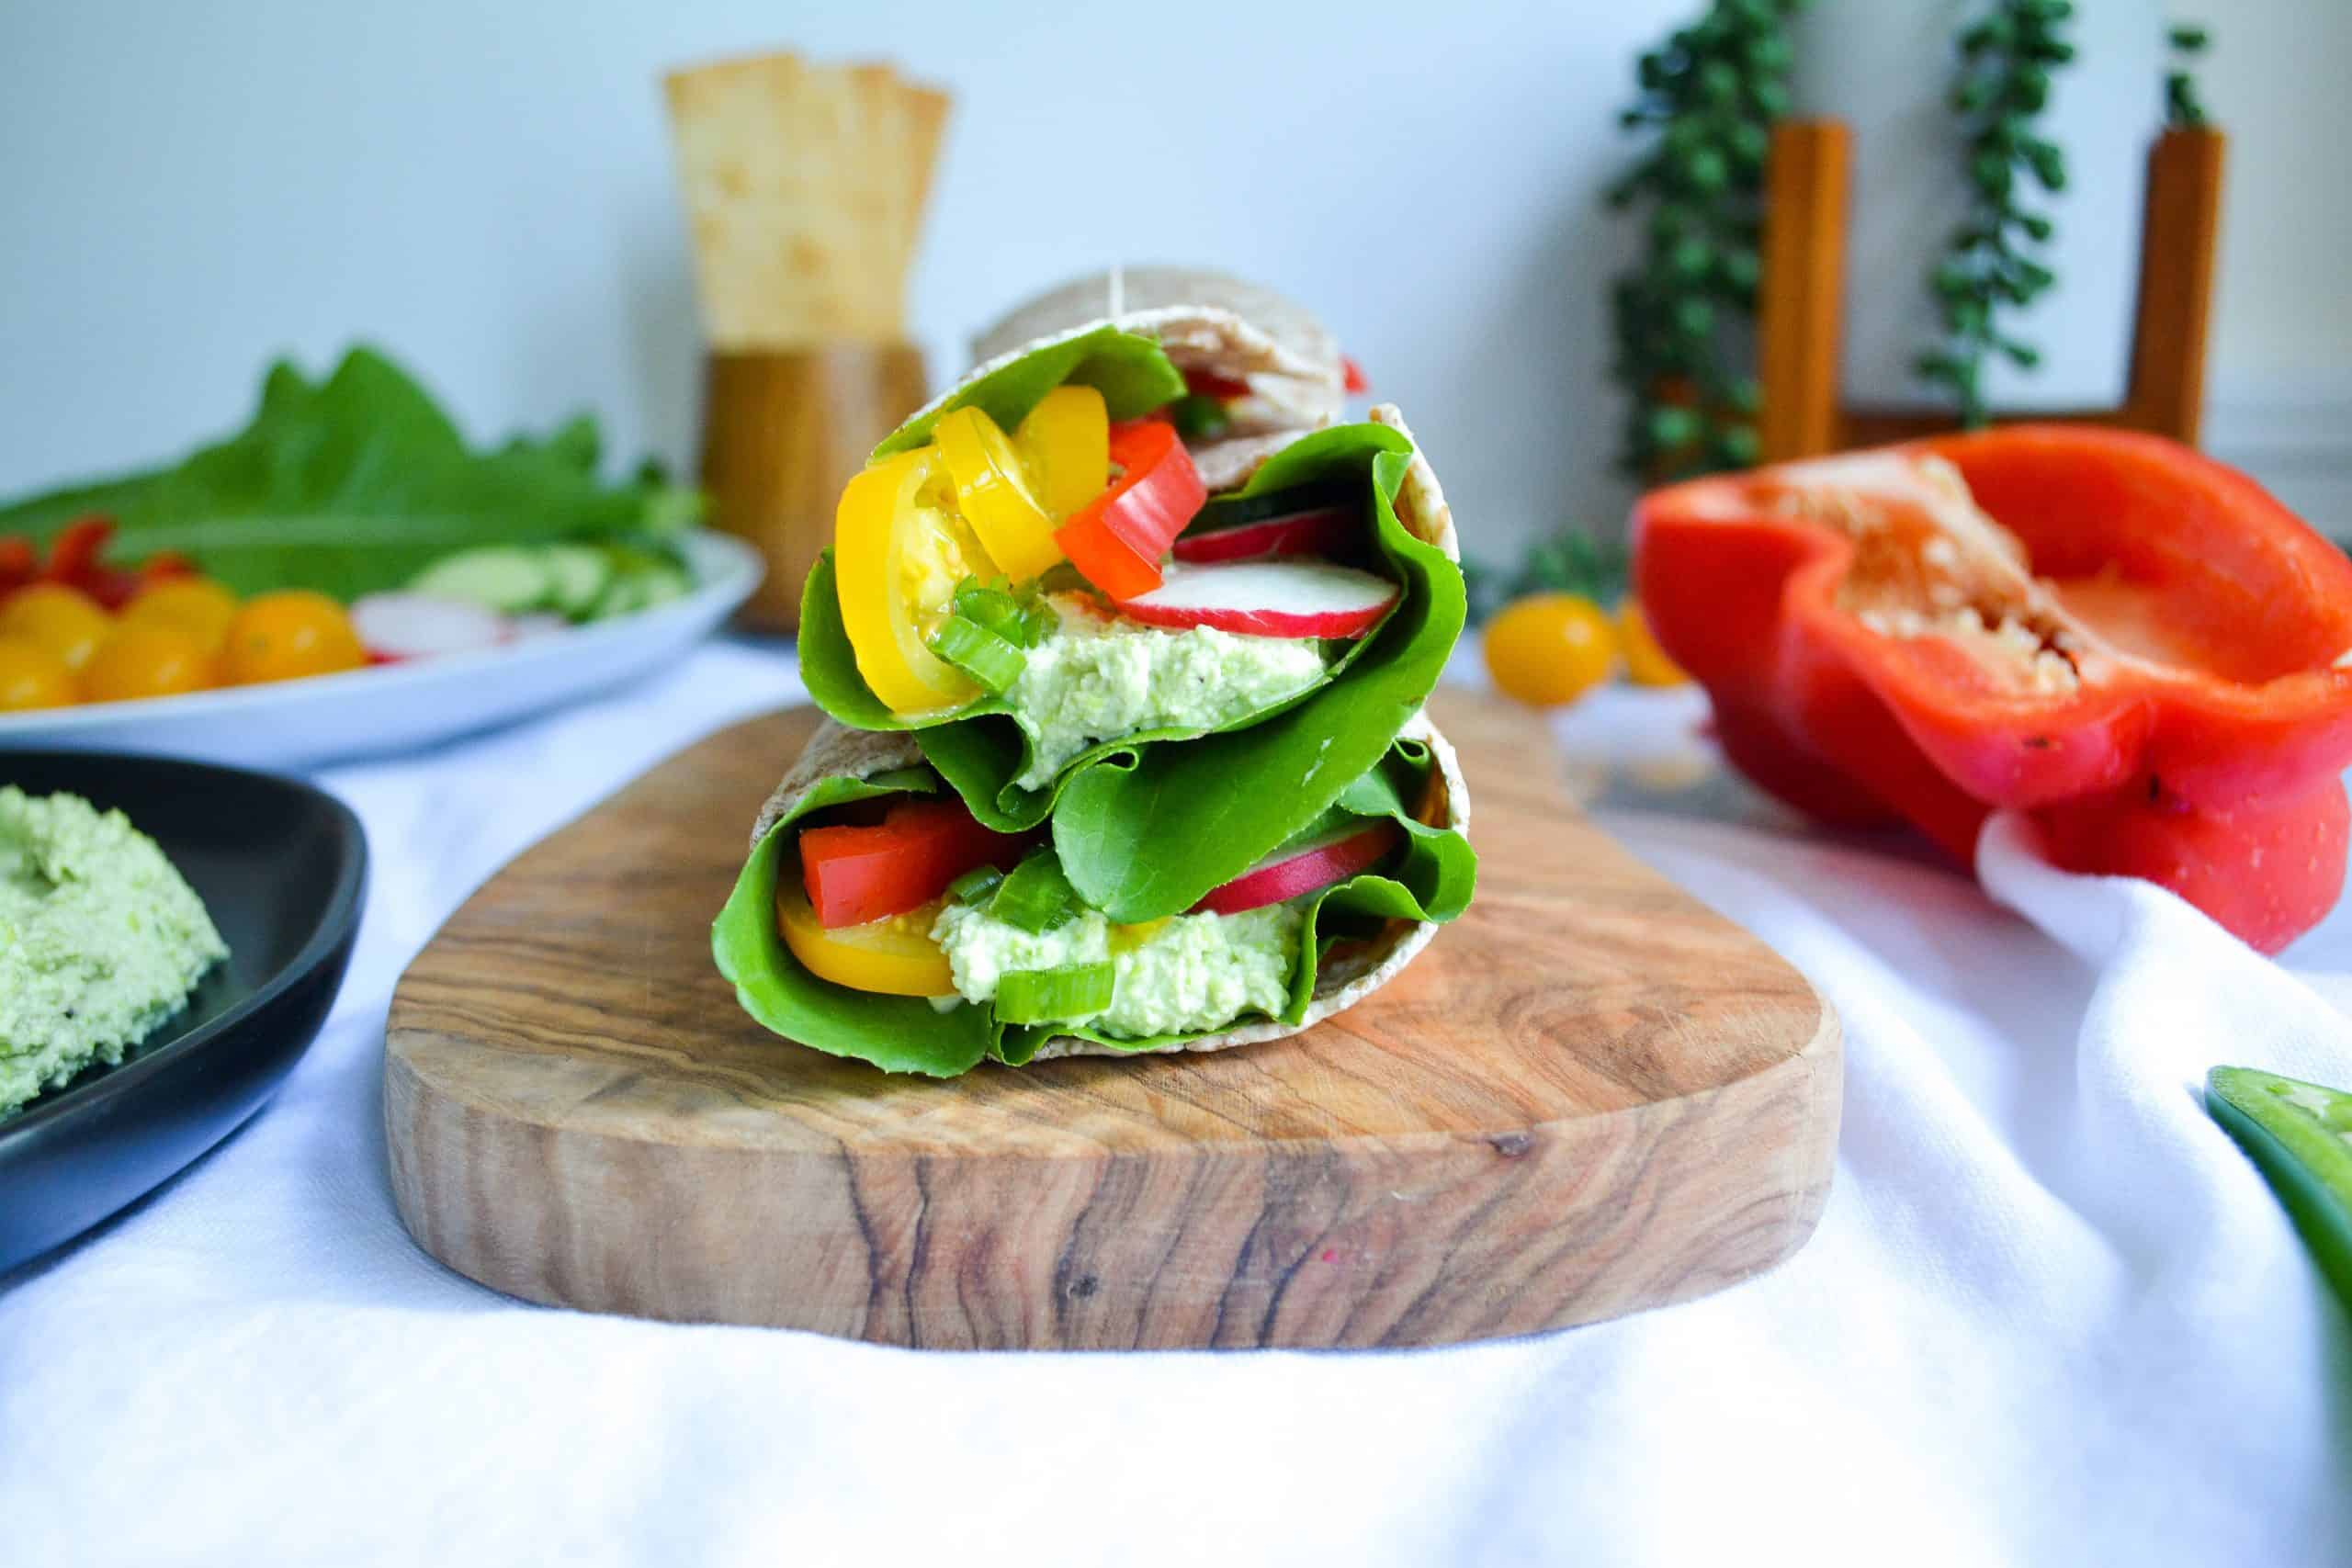 10-Minute Hummus + Veggie Wraps